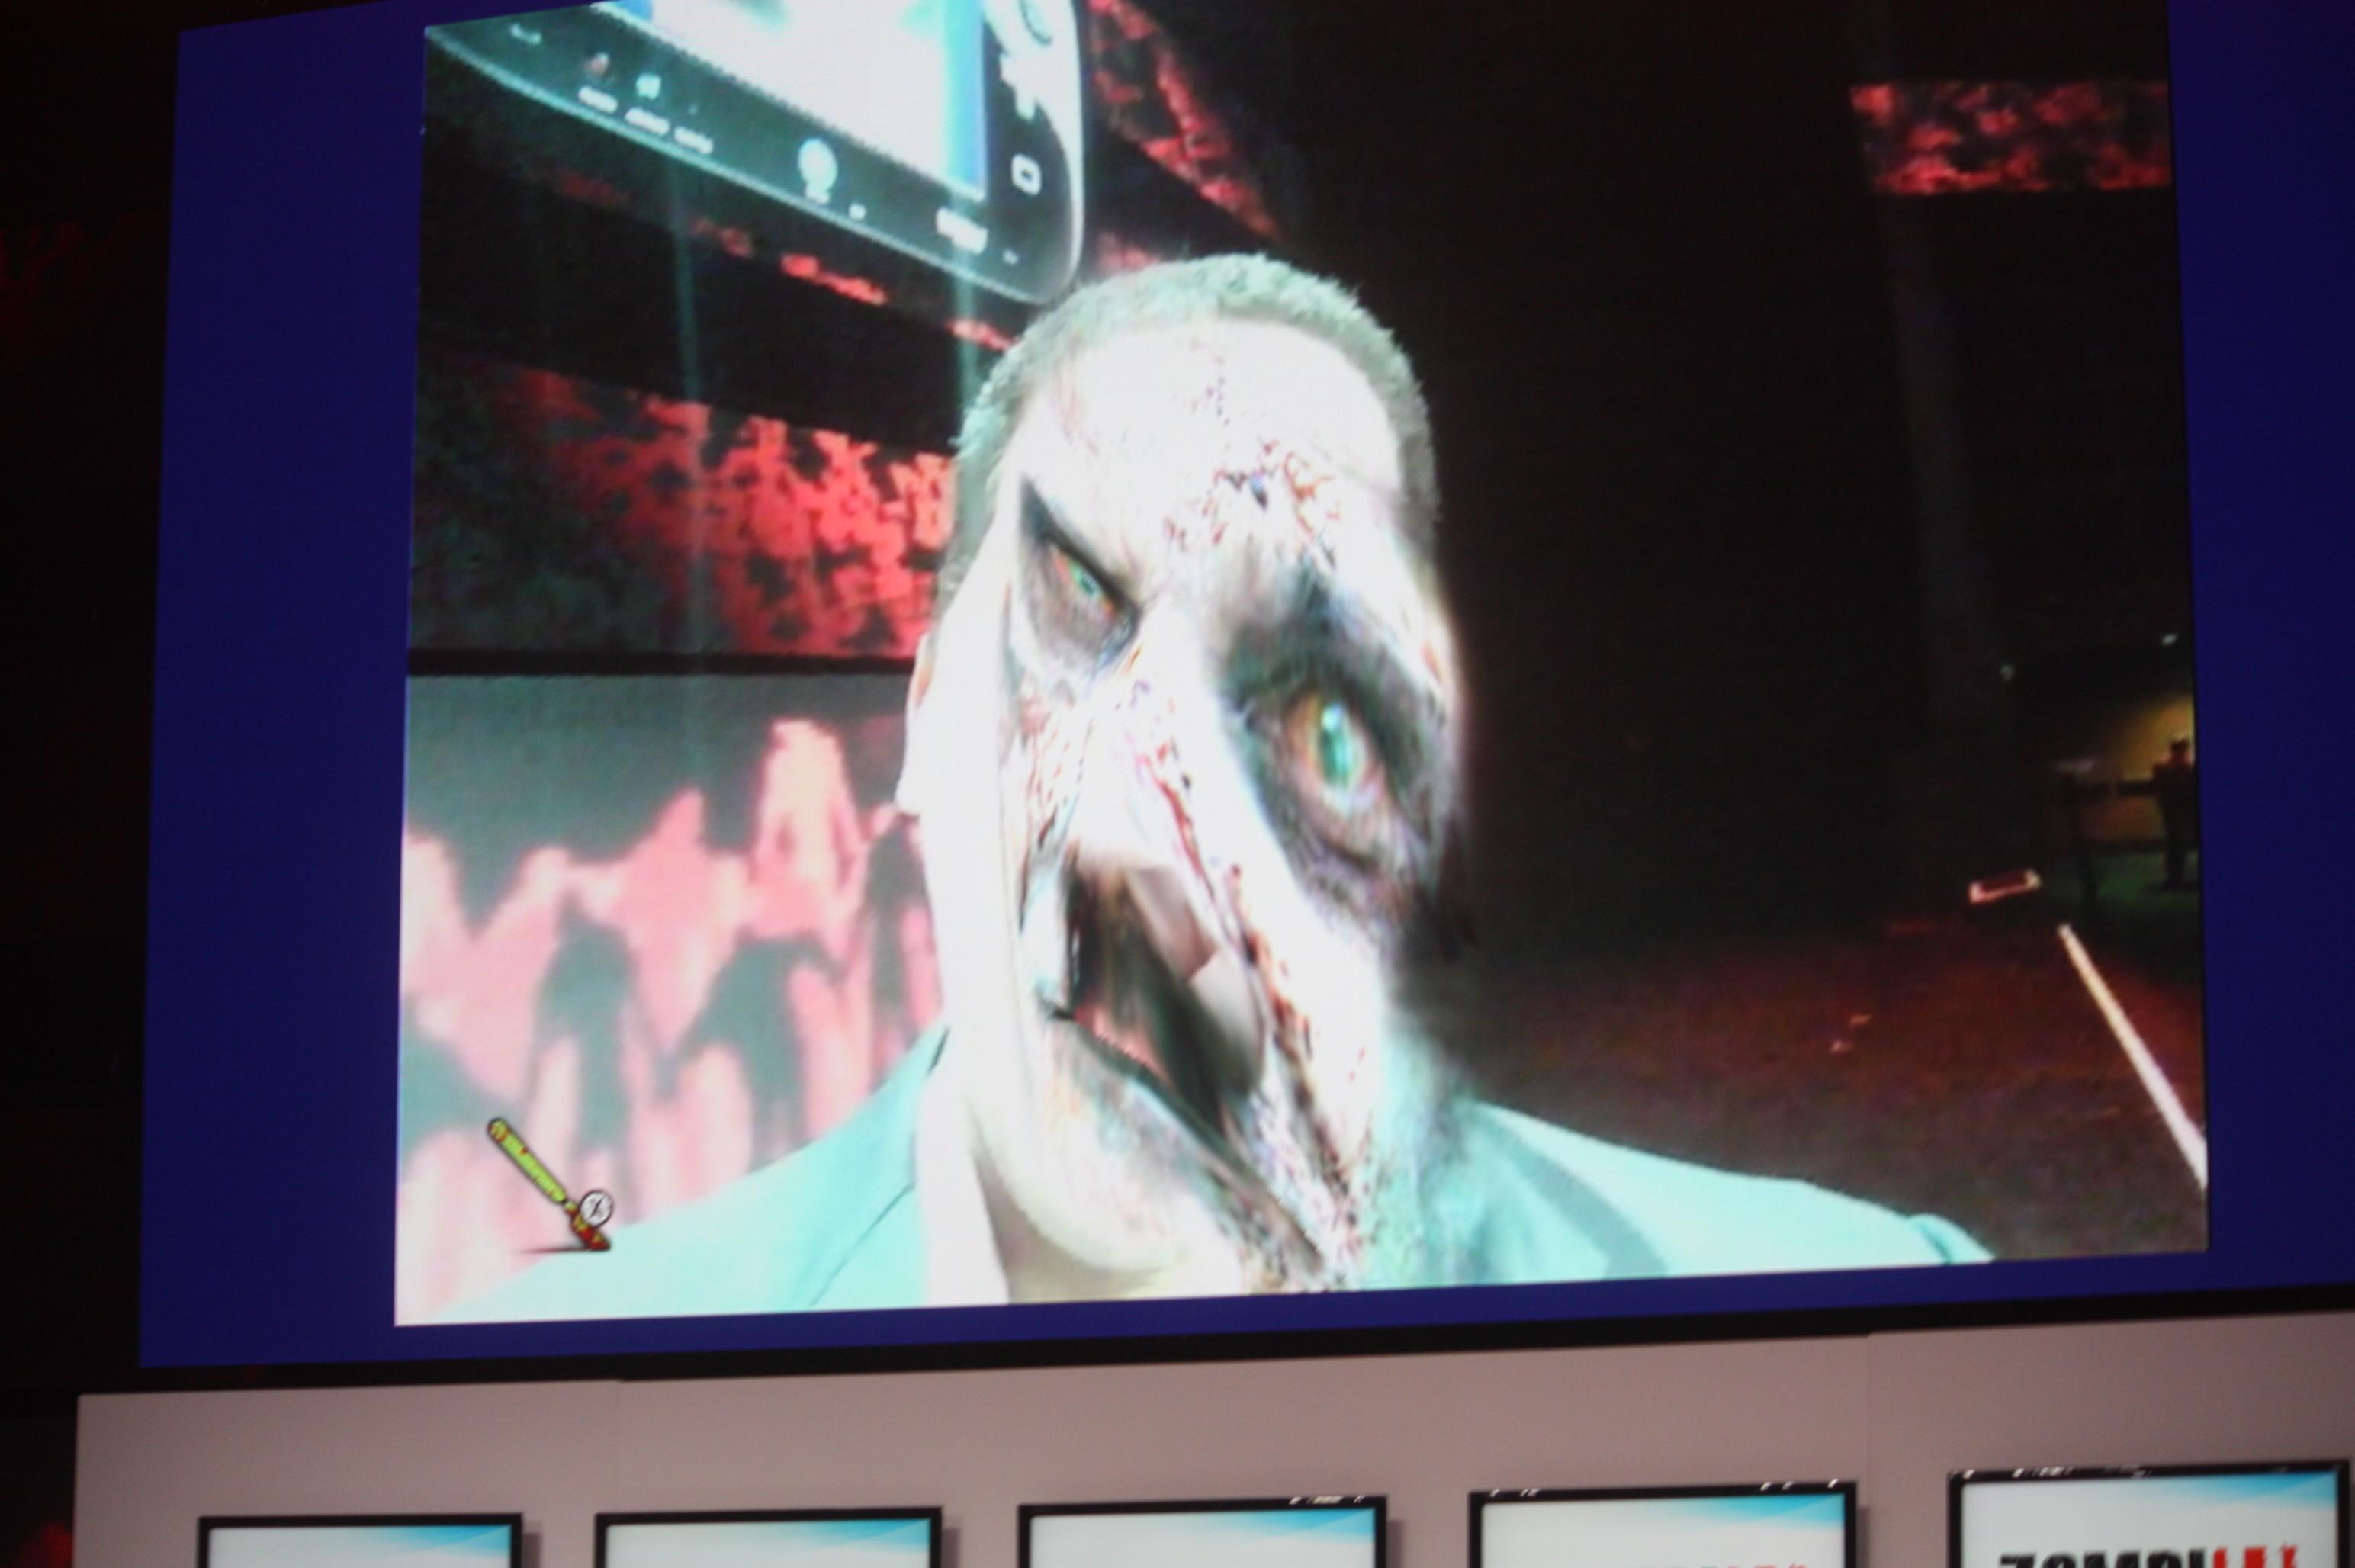 ZombiU Face